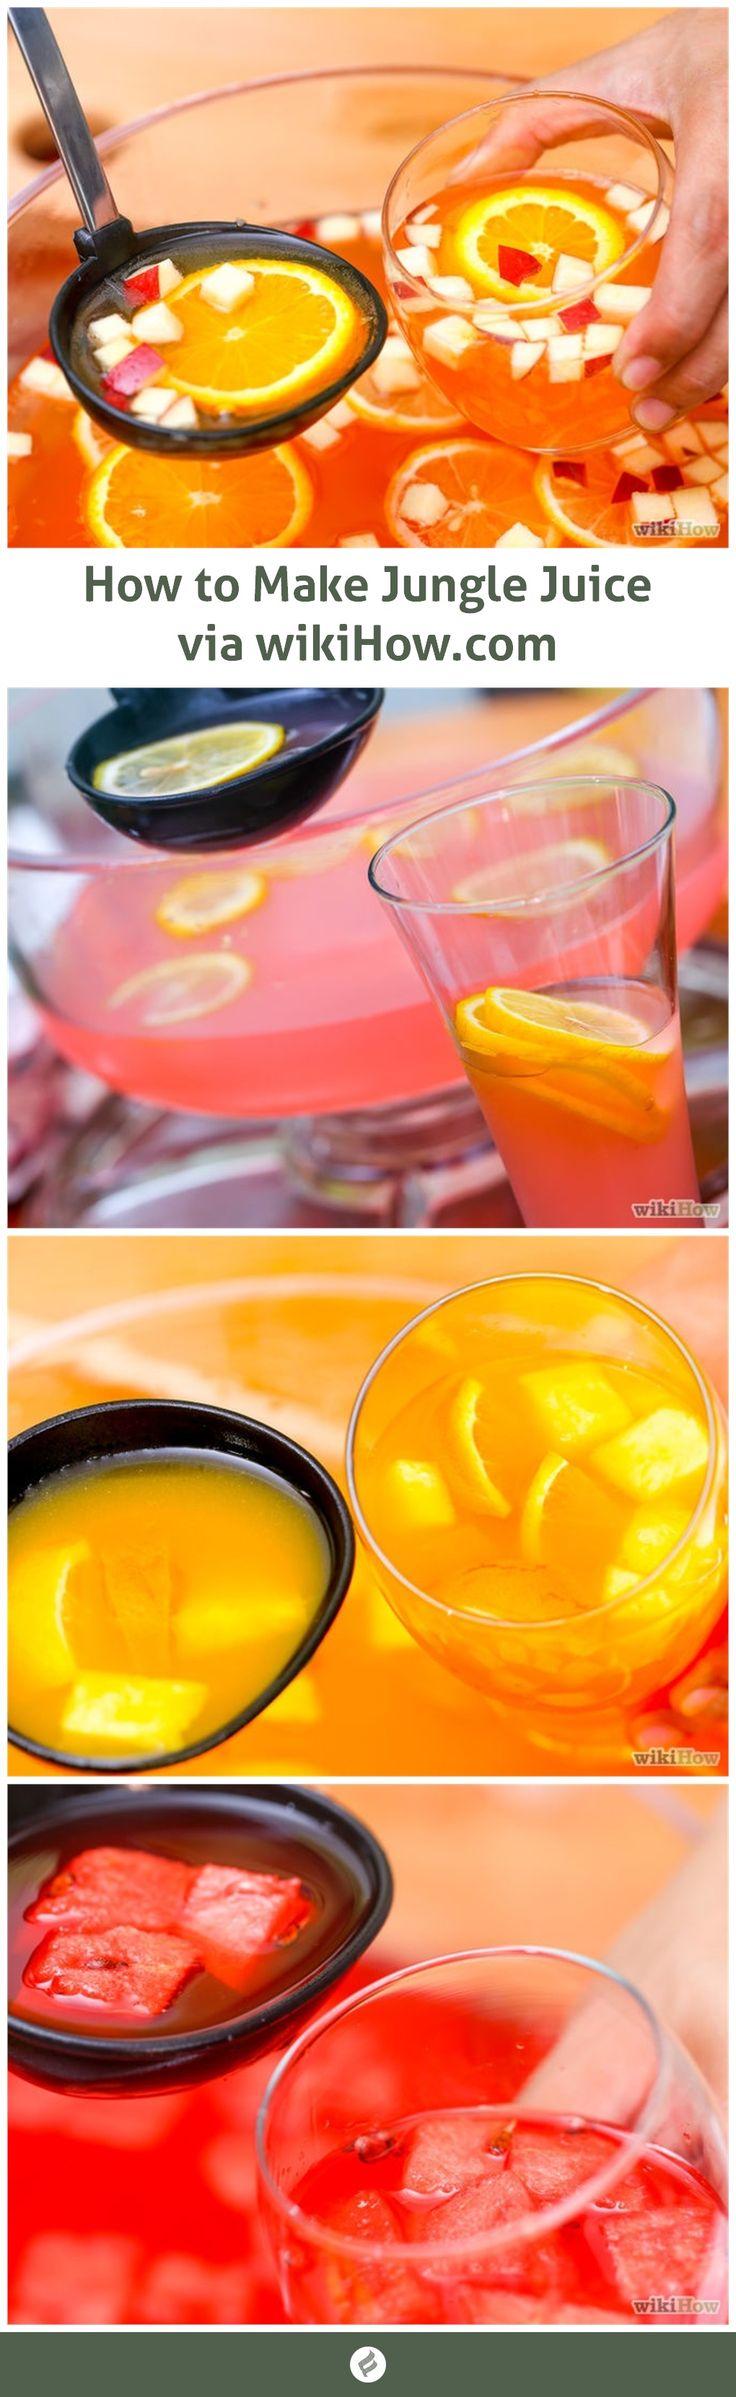 How to Make Jungle Juice via wikiHow.com